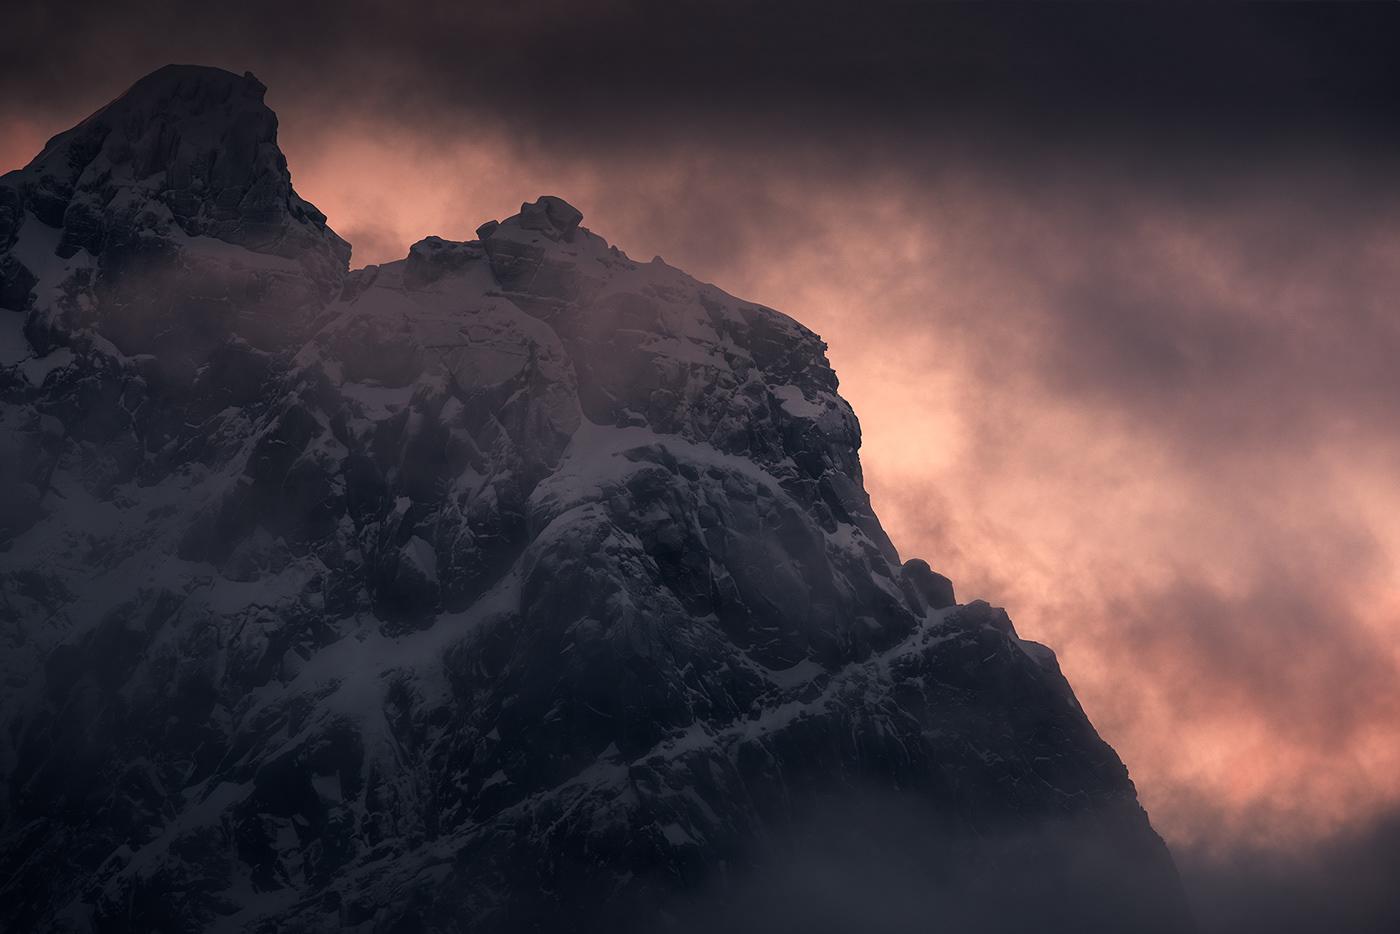 Photography  landscape photography Nature outdoors lofoten norway Arctic mountains digital photography  photoshop